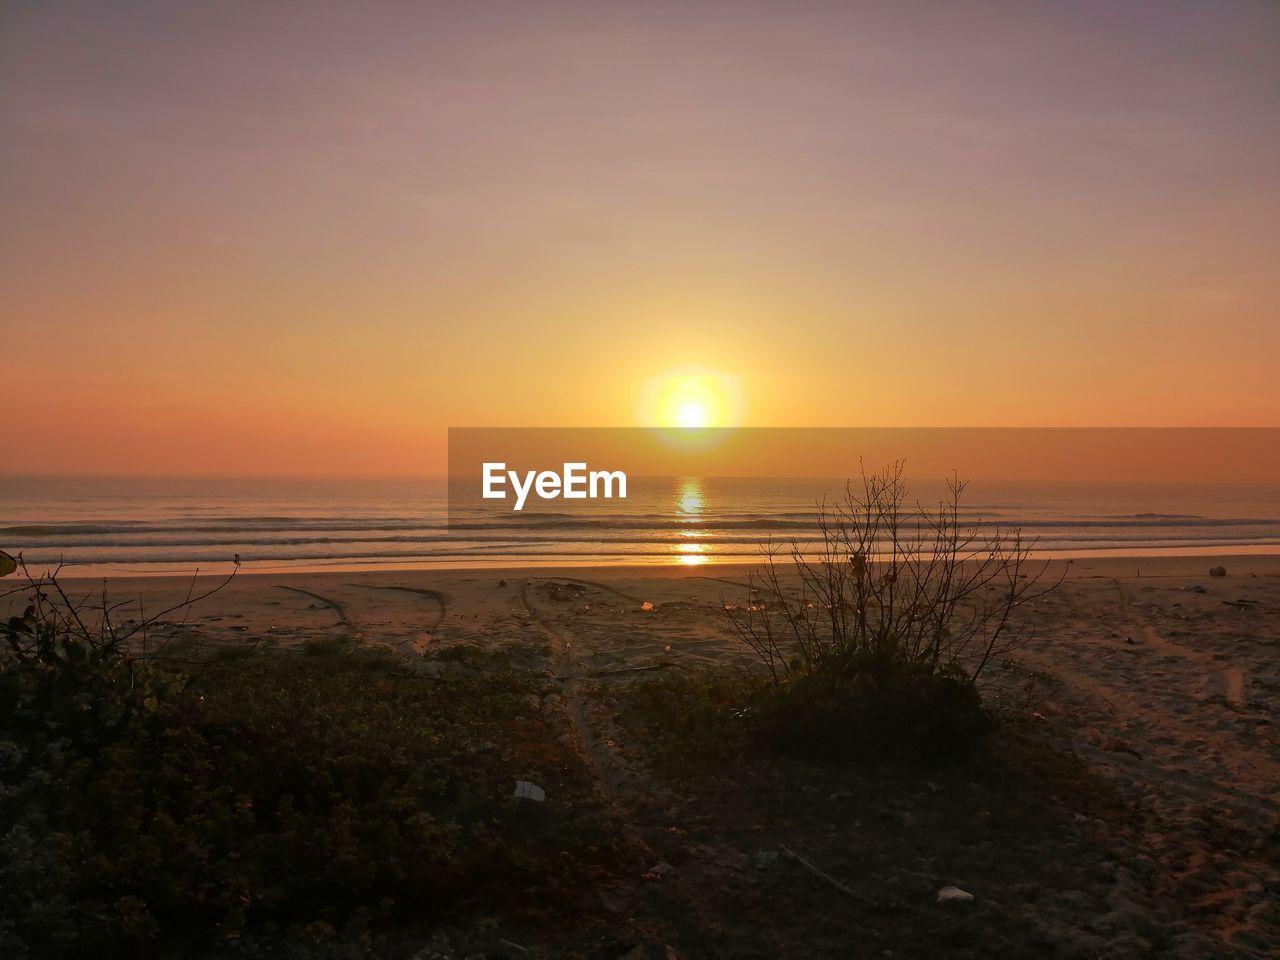 sky, sunset, water, sea, scenics - nature, beauty in nature, beach, land, tranquility, tranquil scene, sun, horizon, nature, horizon over water, no people, idyllic, orange color, non-urban scene, outdoors